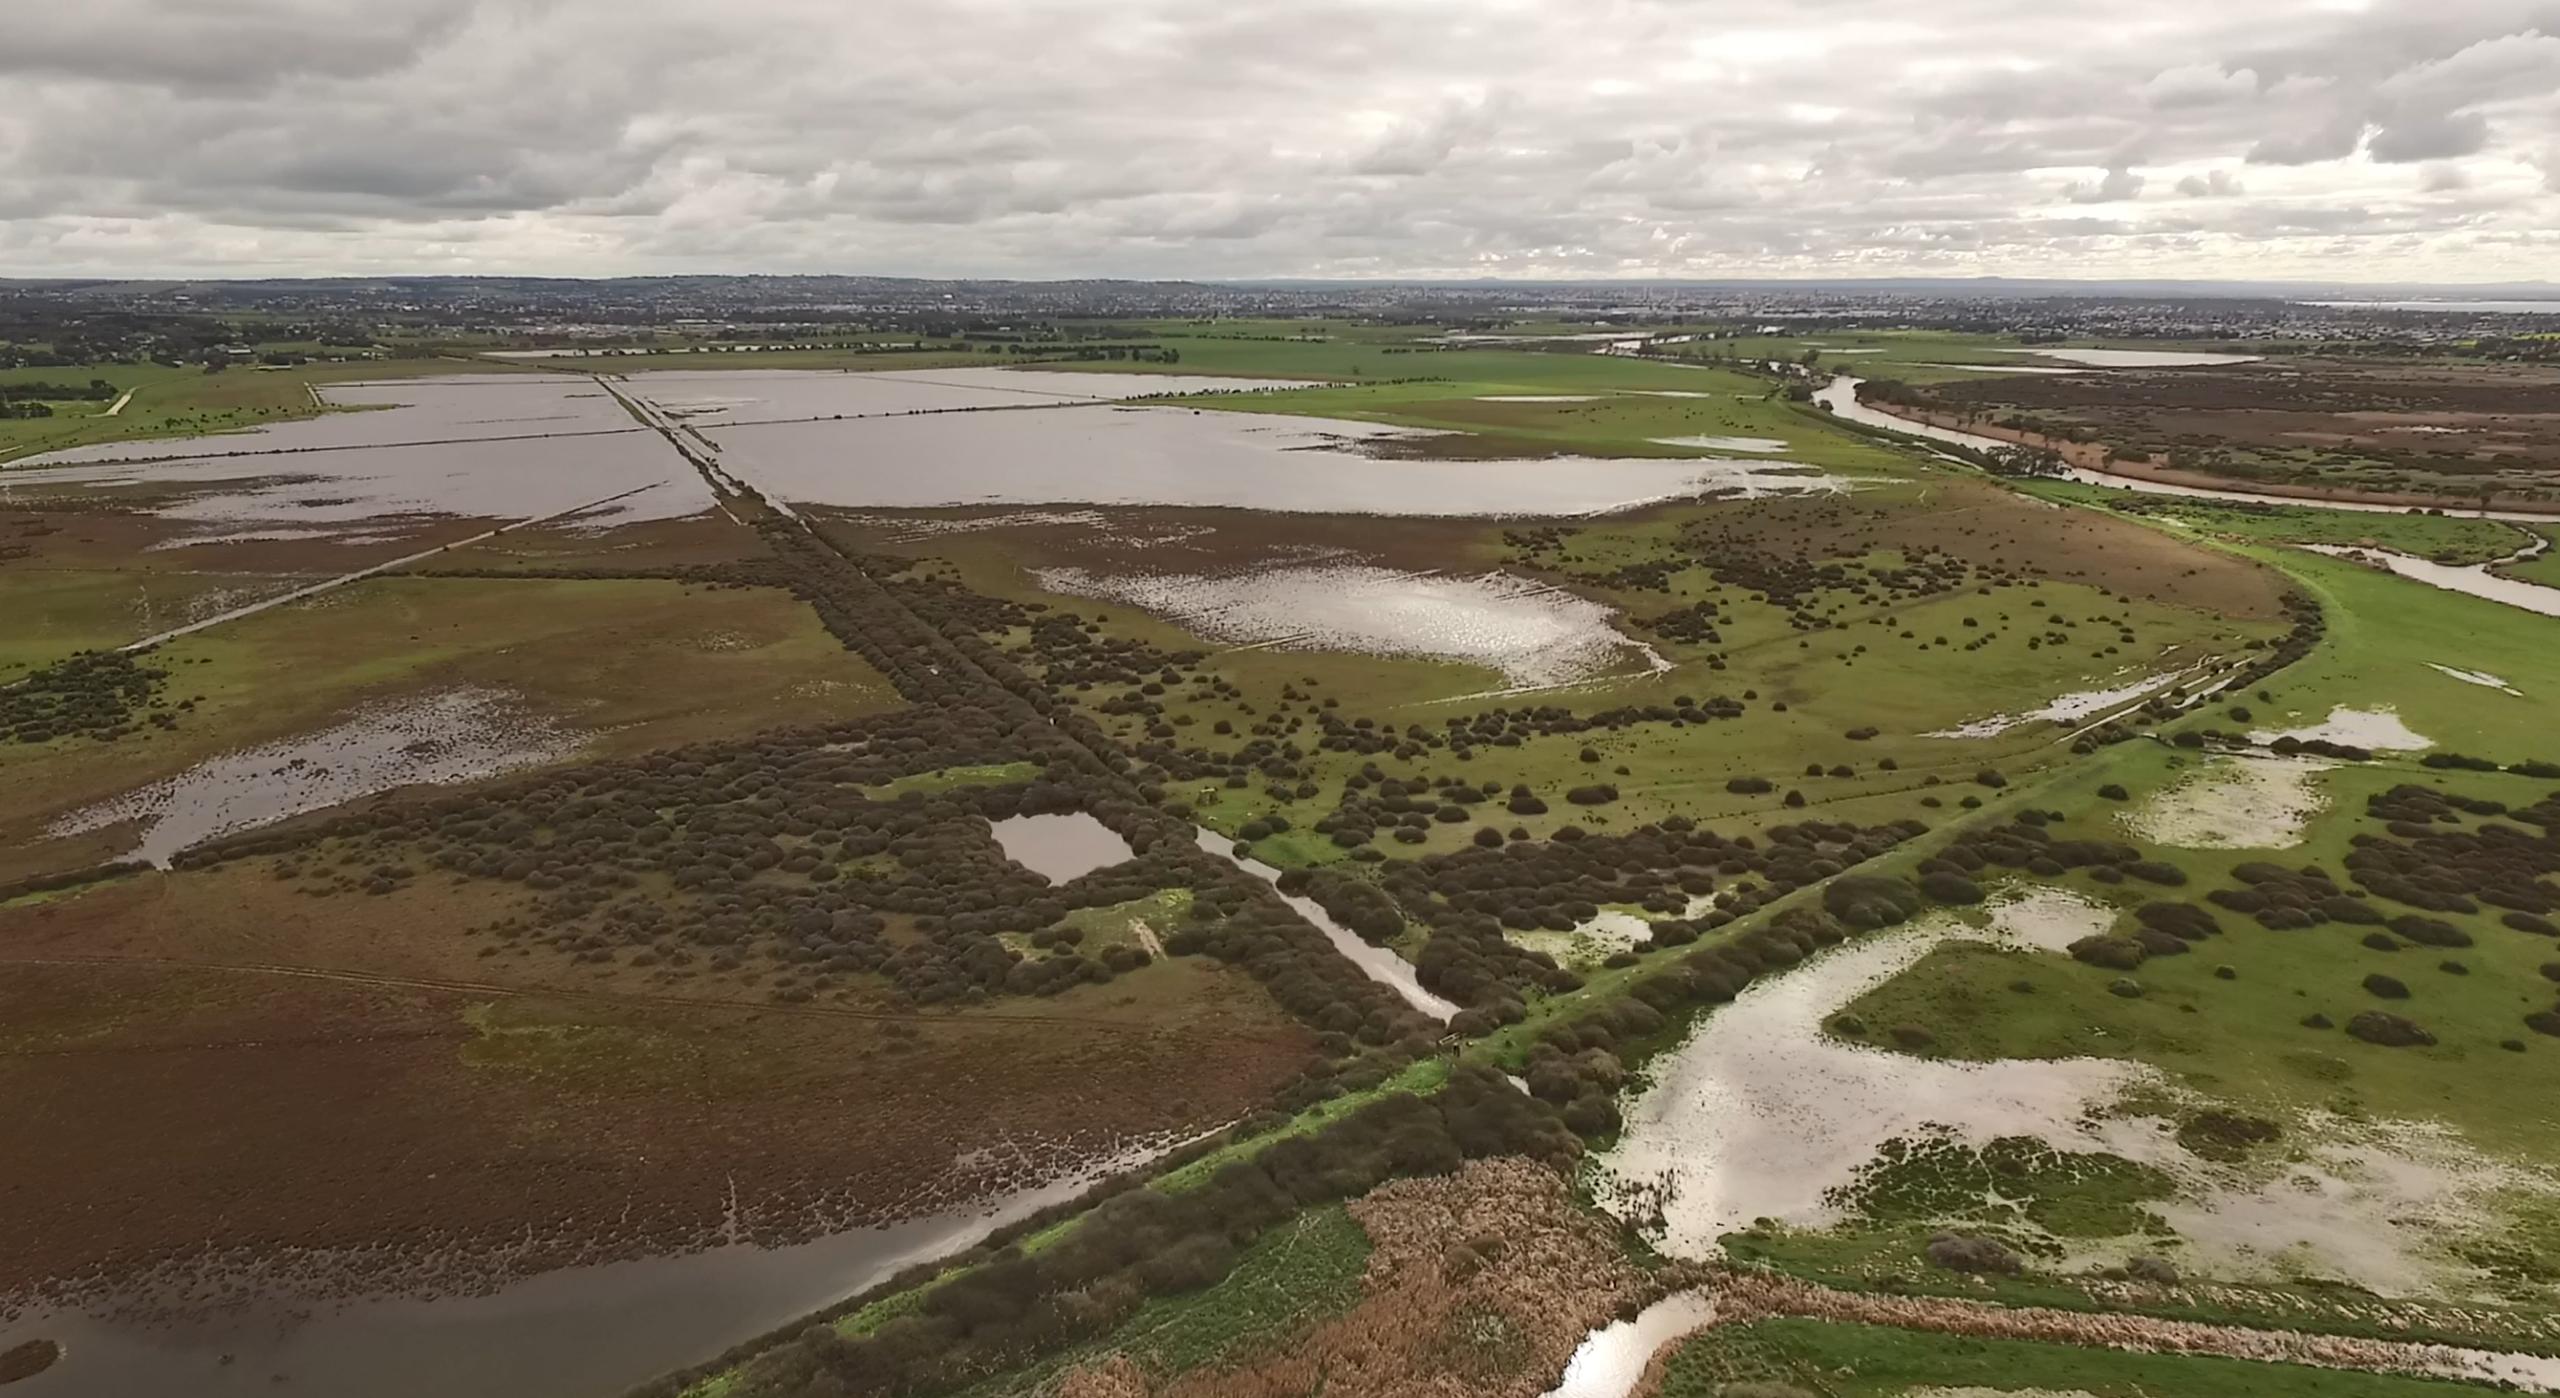 Sparrovale wetlands